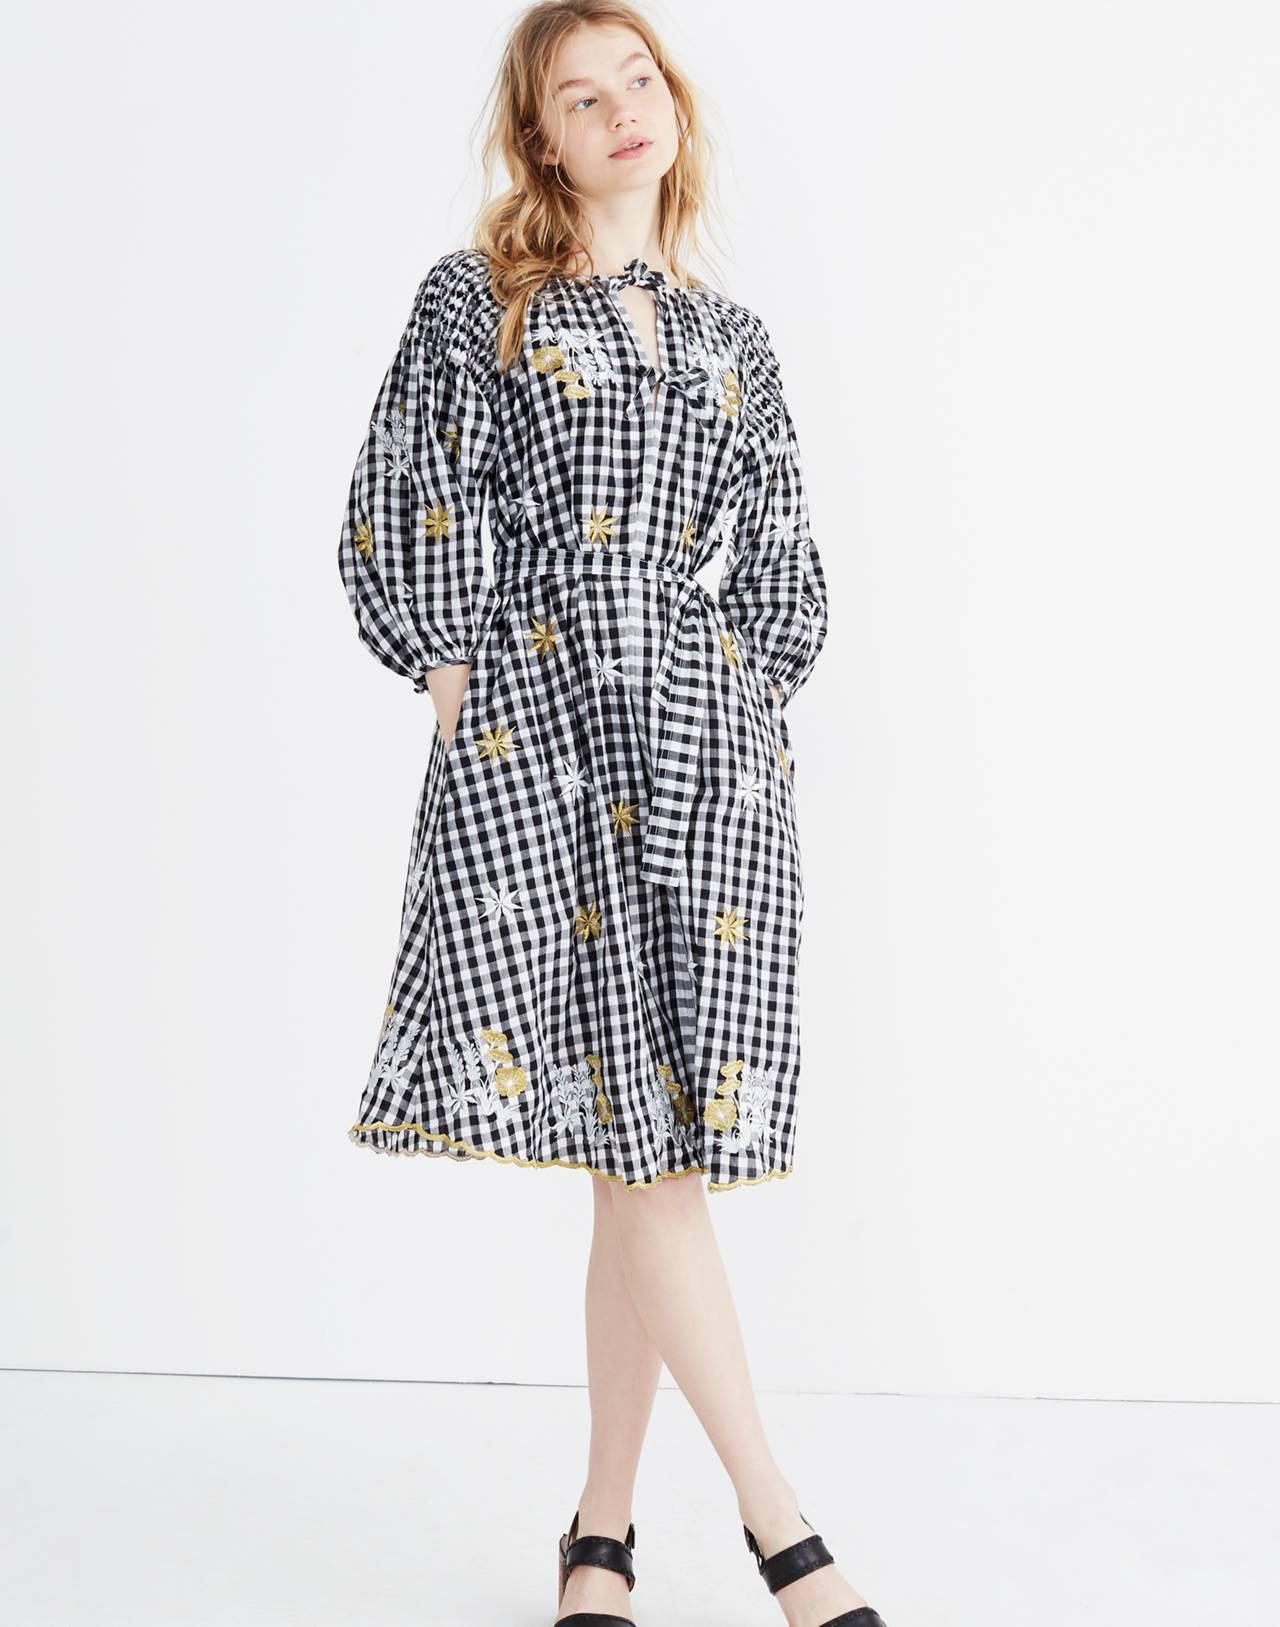 Innika Choo Smocked Gingham Avens Midi Dress in black check image 1